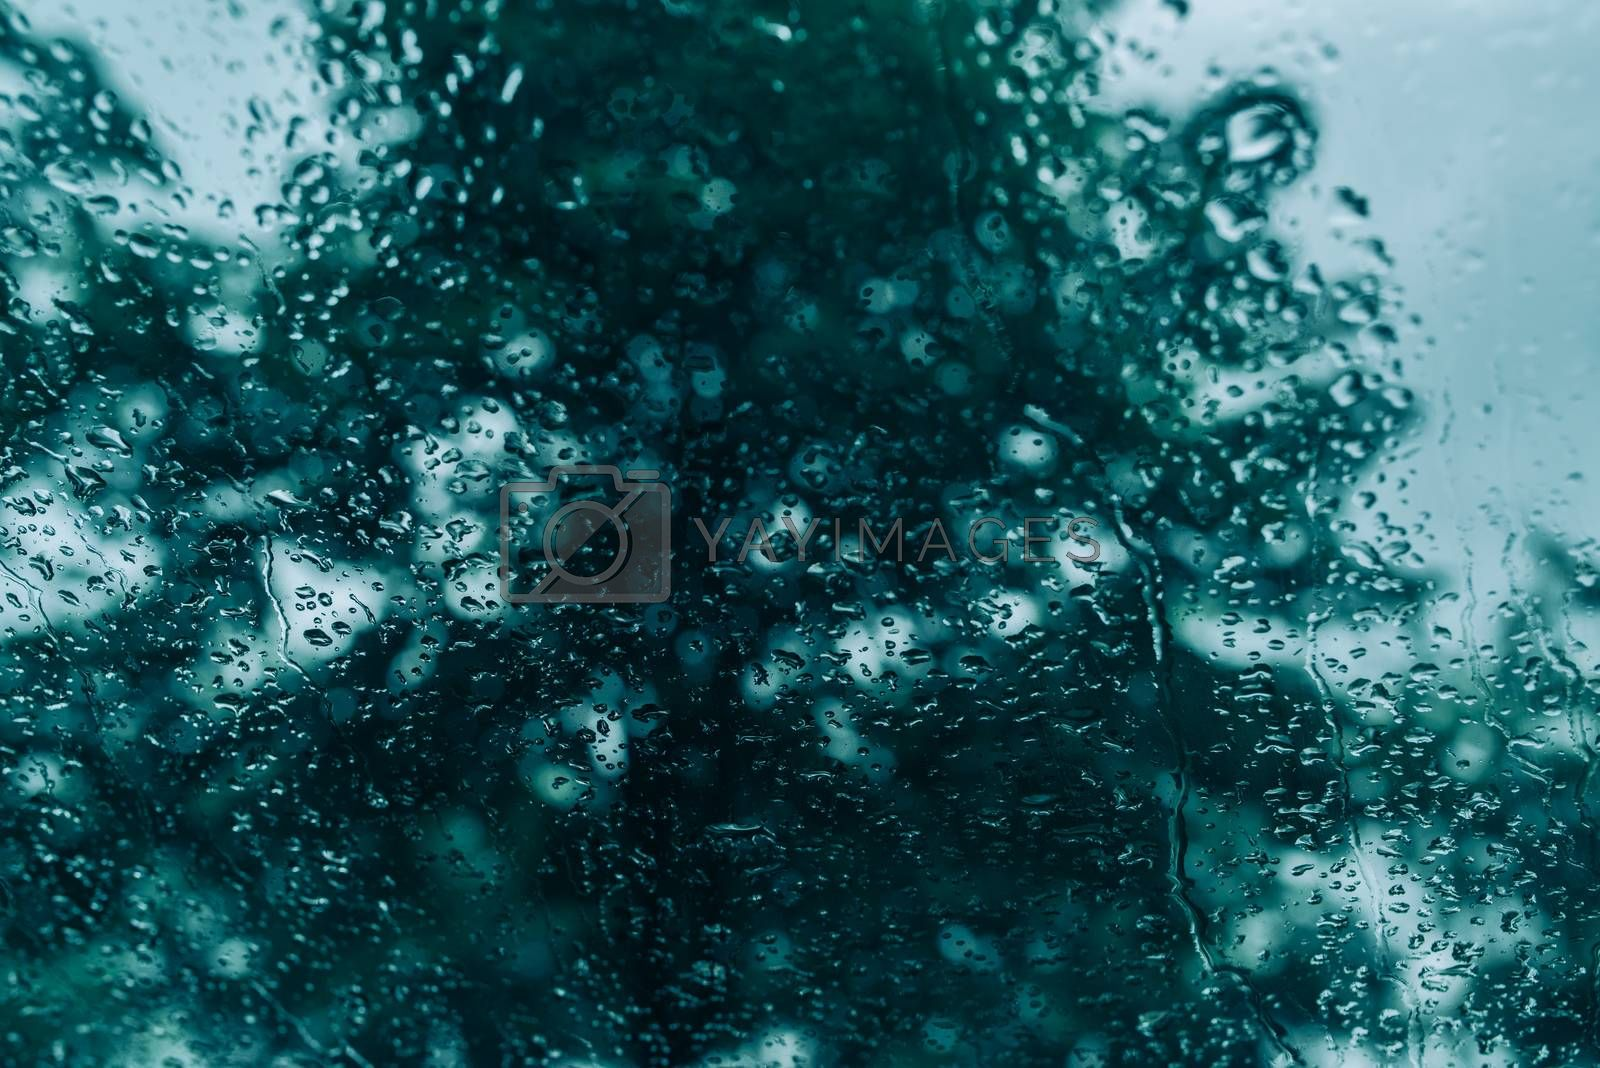 Raindrops on window pane, blur treetop in background, selective focus